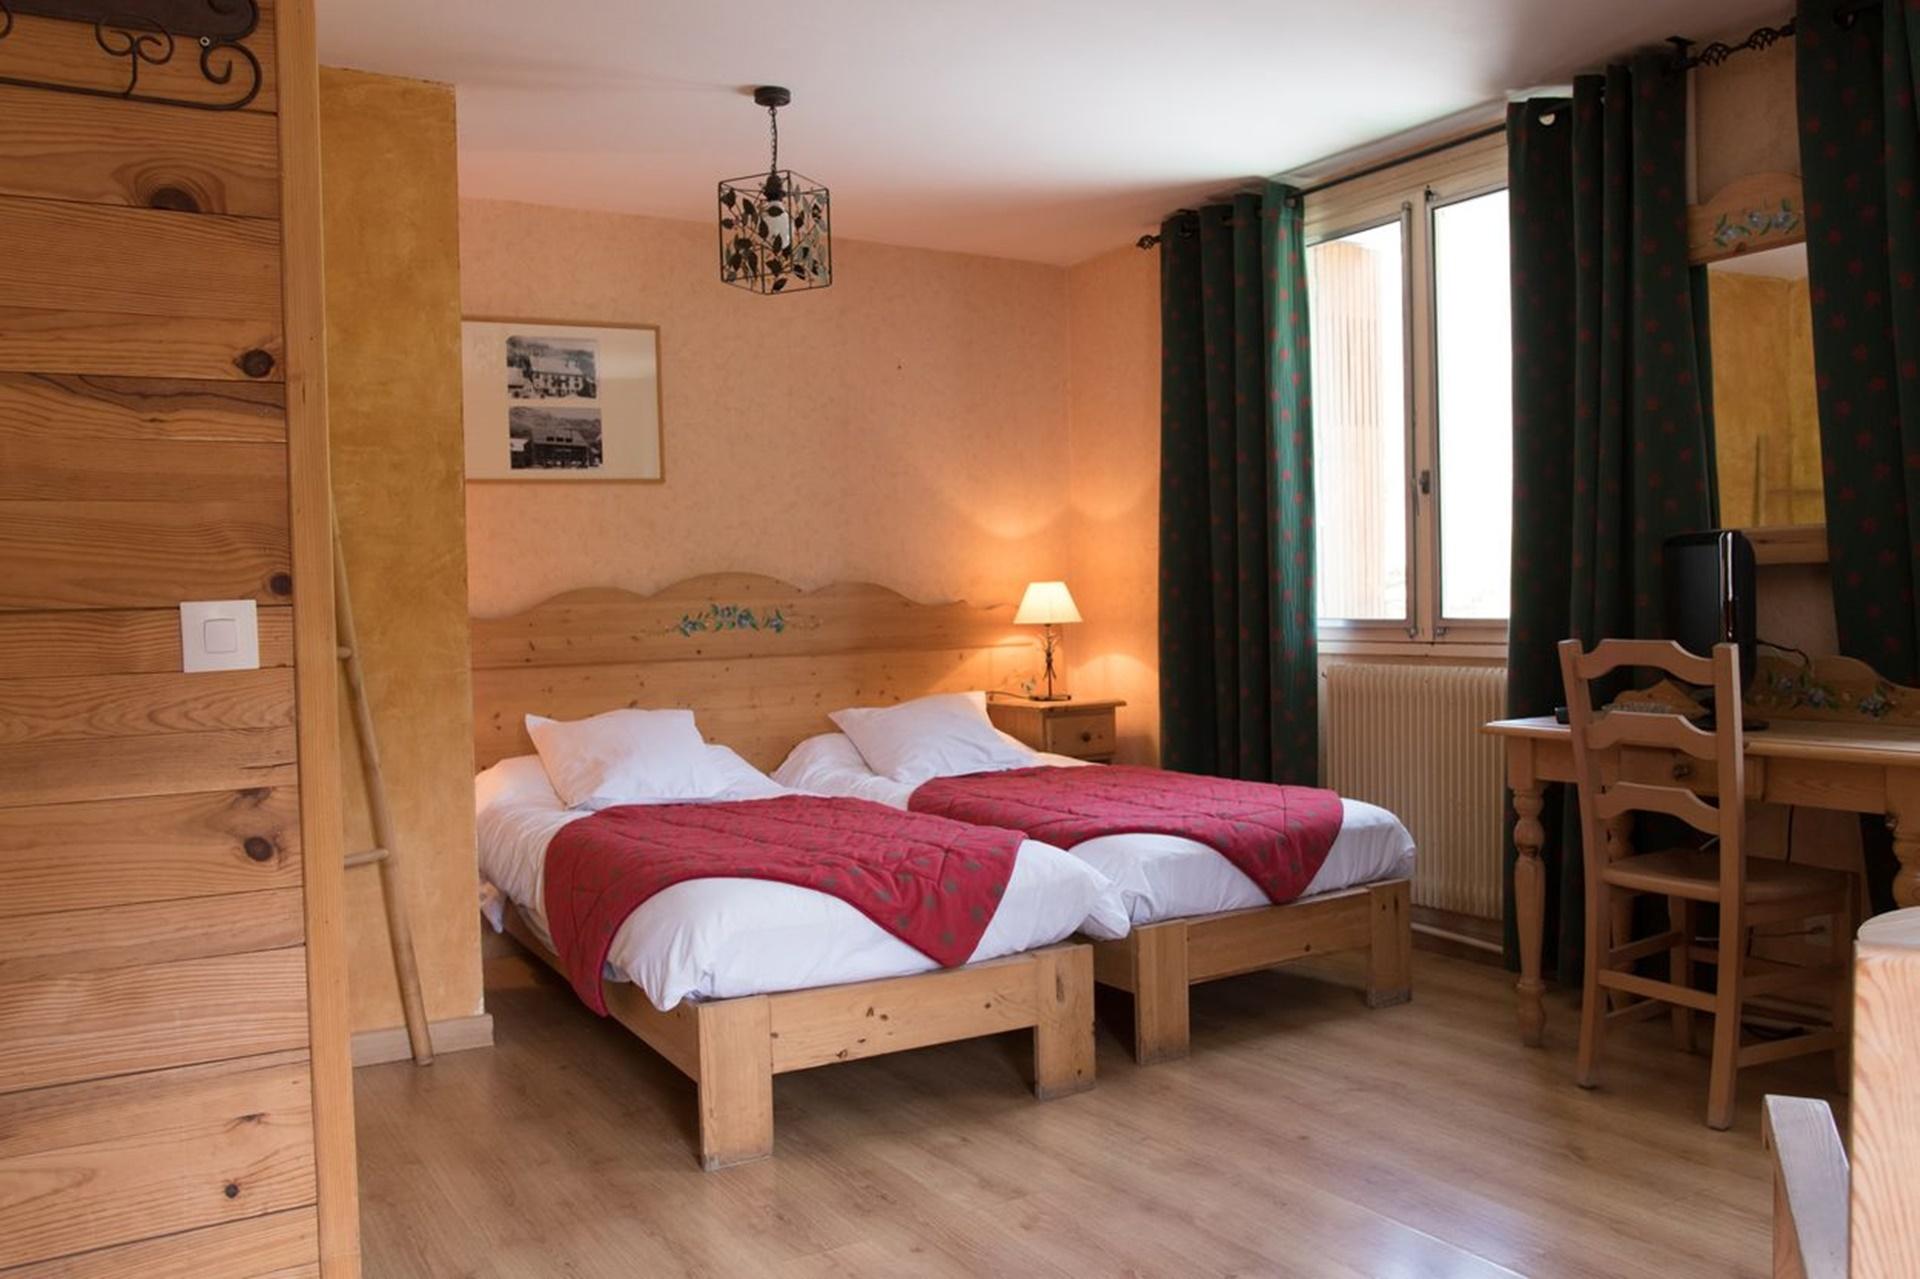 Chambres suites juniors 05872